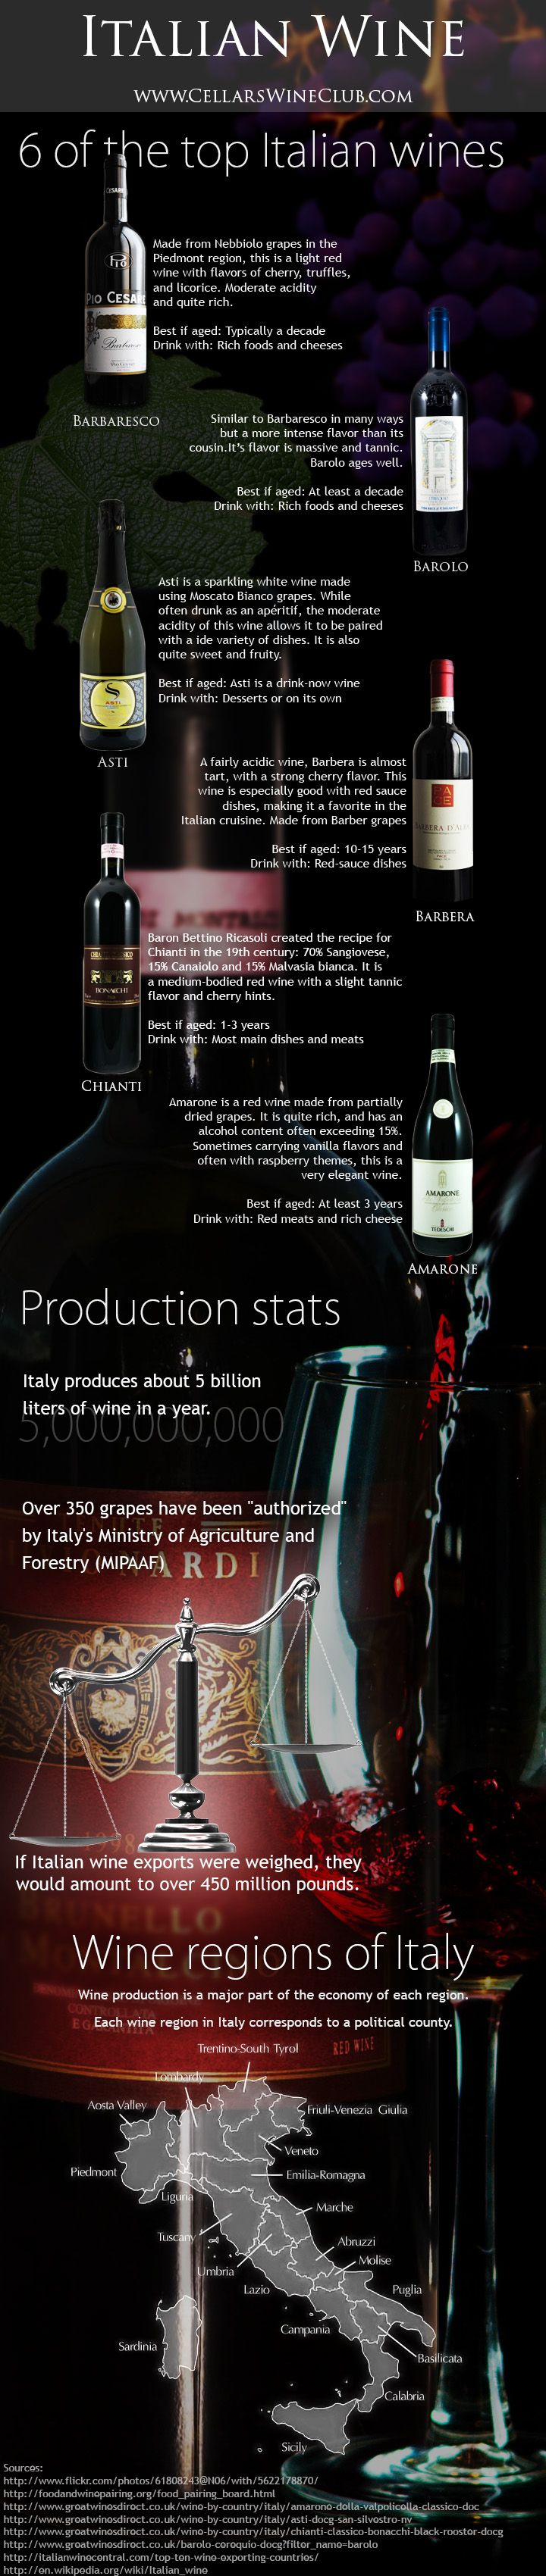 Italian Wine: 6 Of The Top Italian Wines [INFOGRAPHIC] #Italian #wine